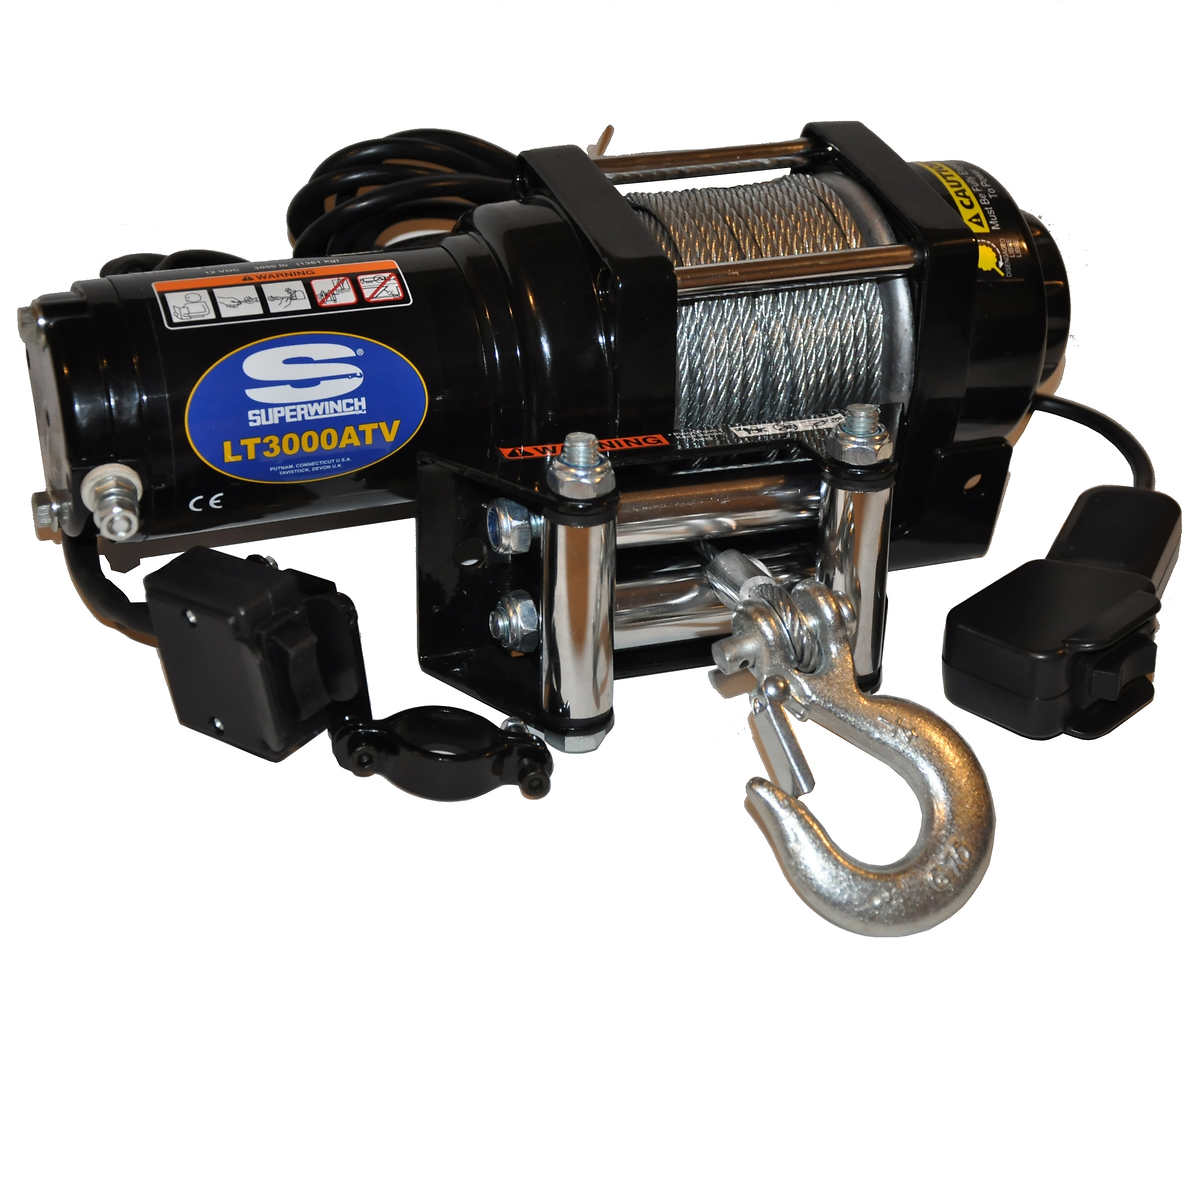 Superwinch® 1,363 6 kg (3,000 lb ) ATV Winch